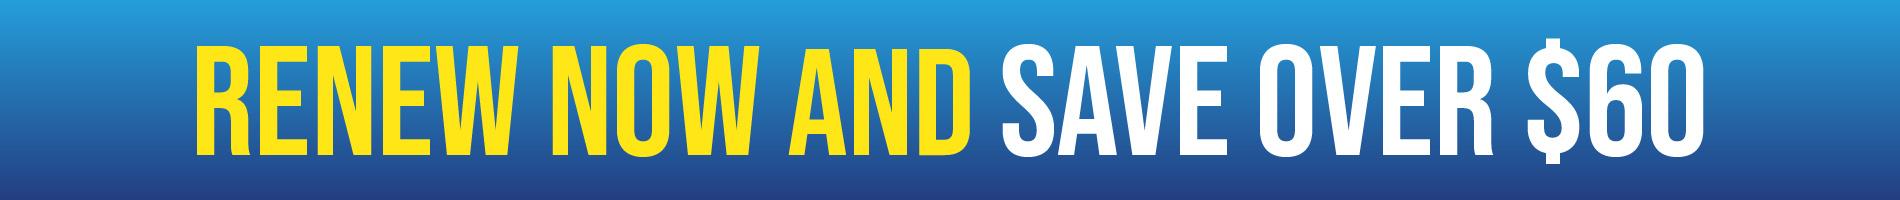 SeaWorld and Aquatica Orlando Renew Now